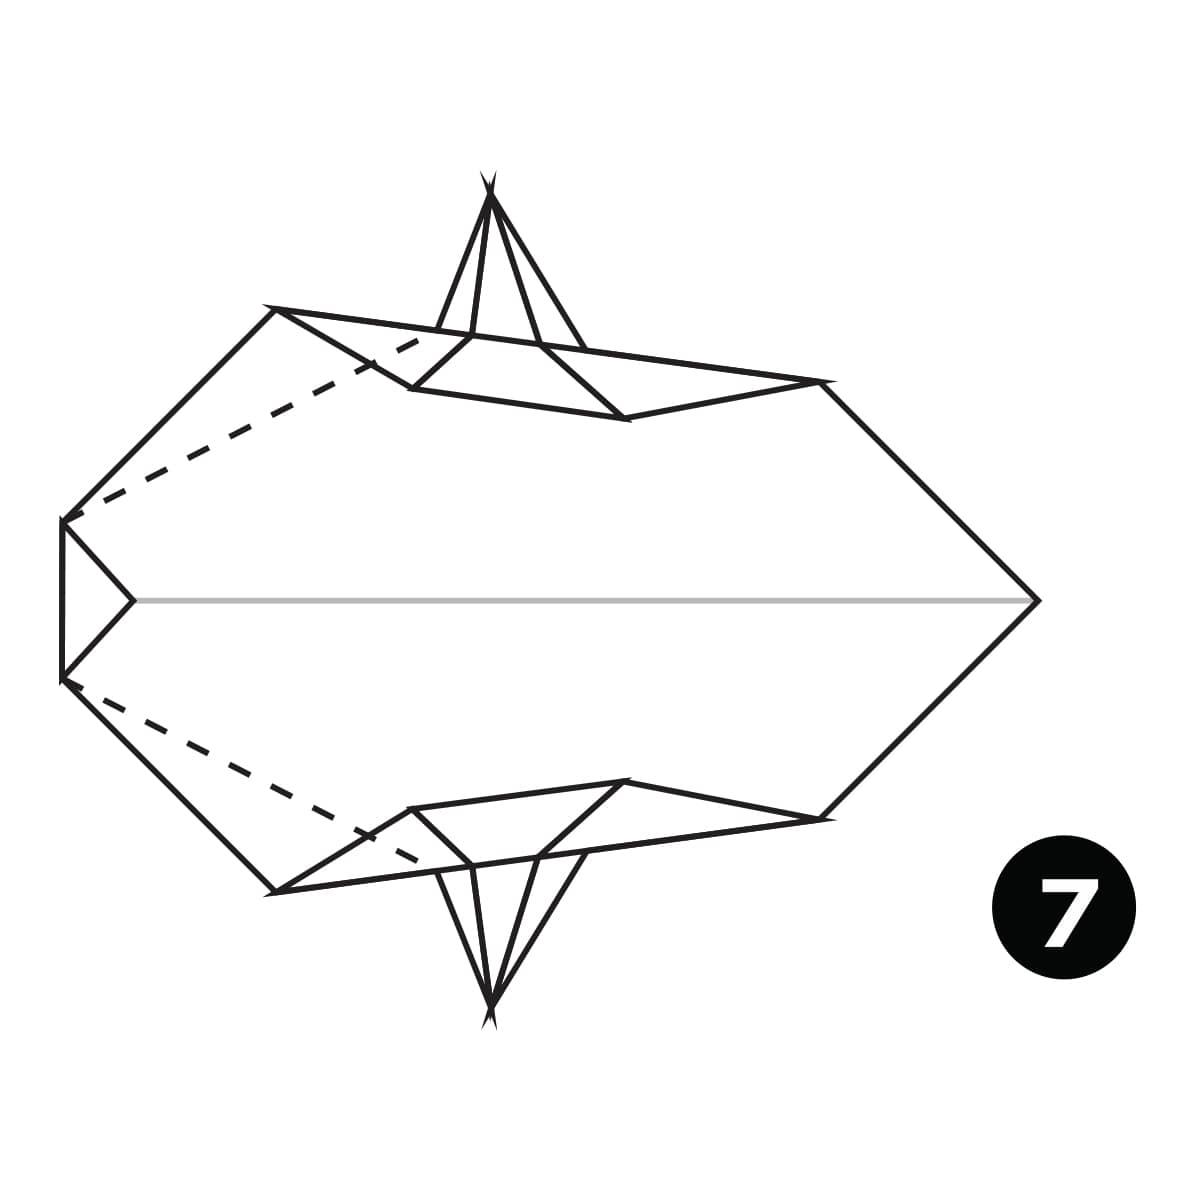 Cow Step 7